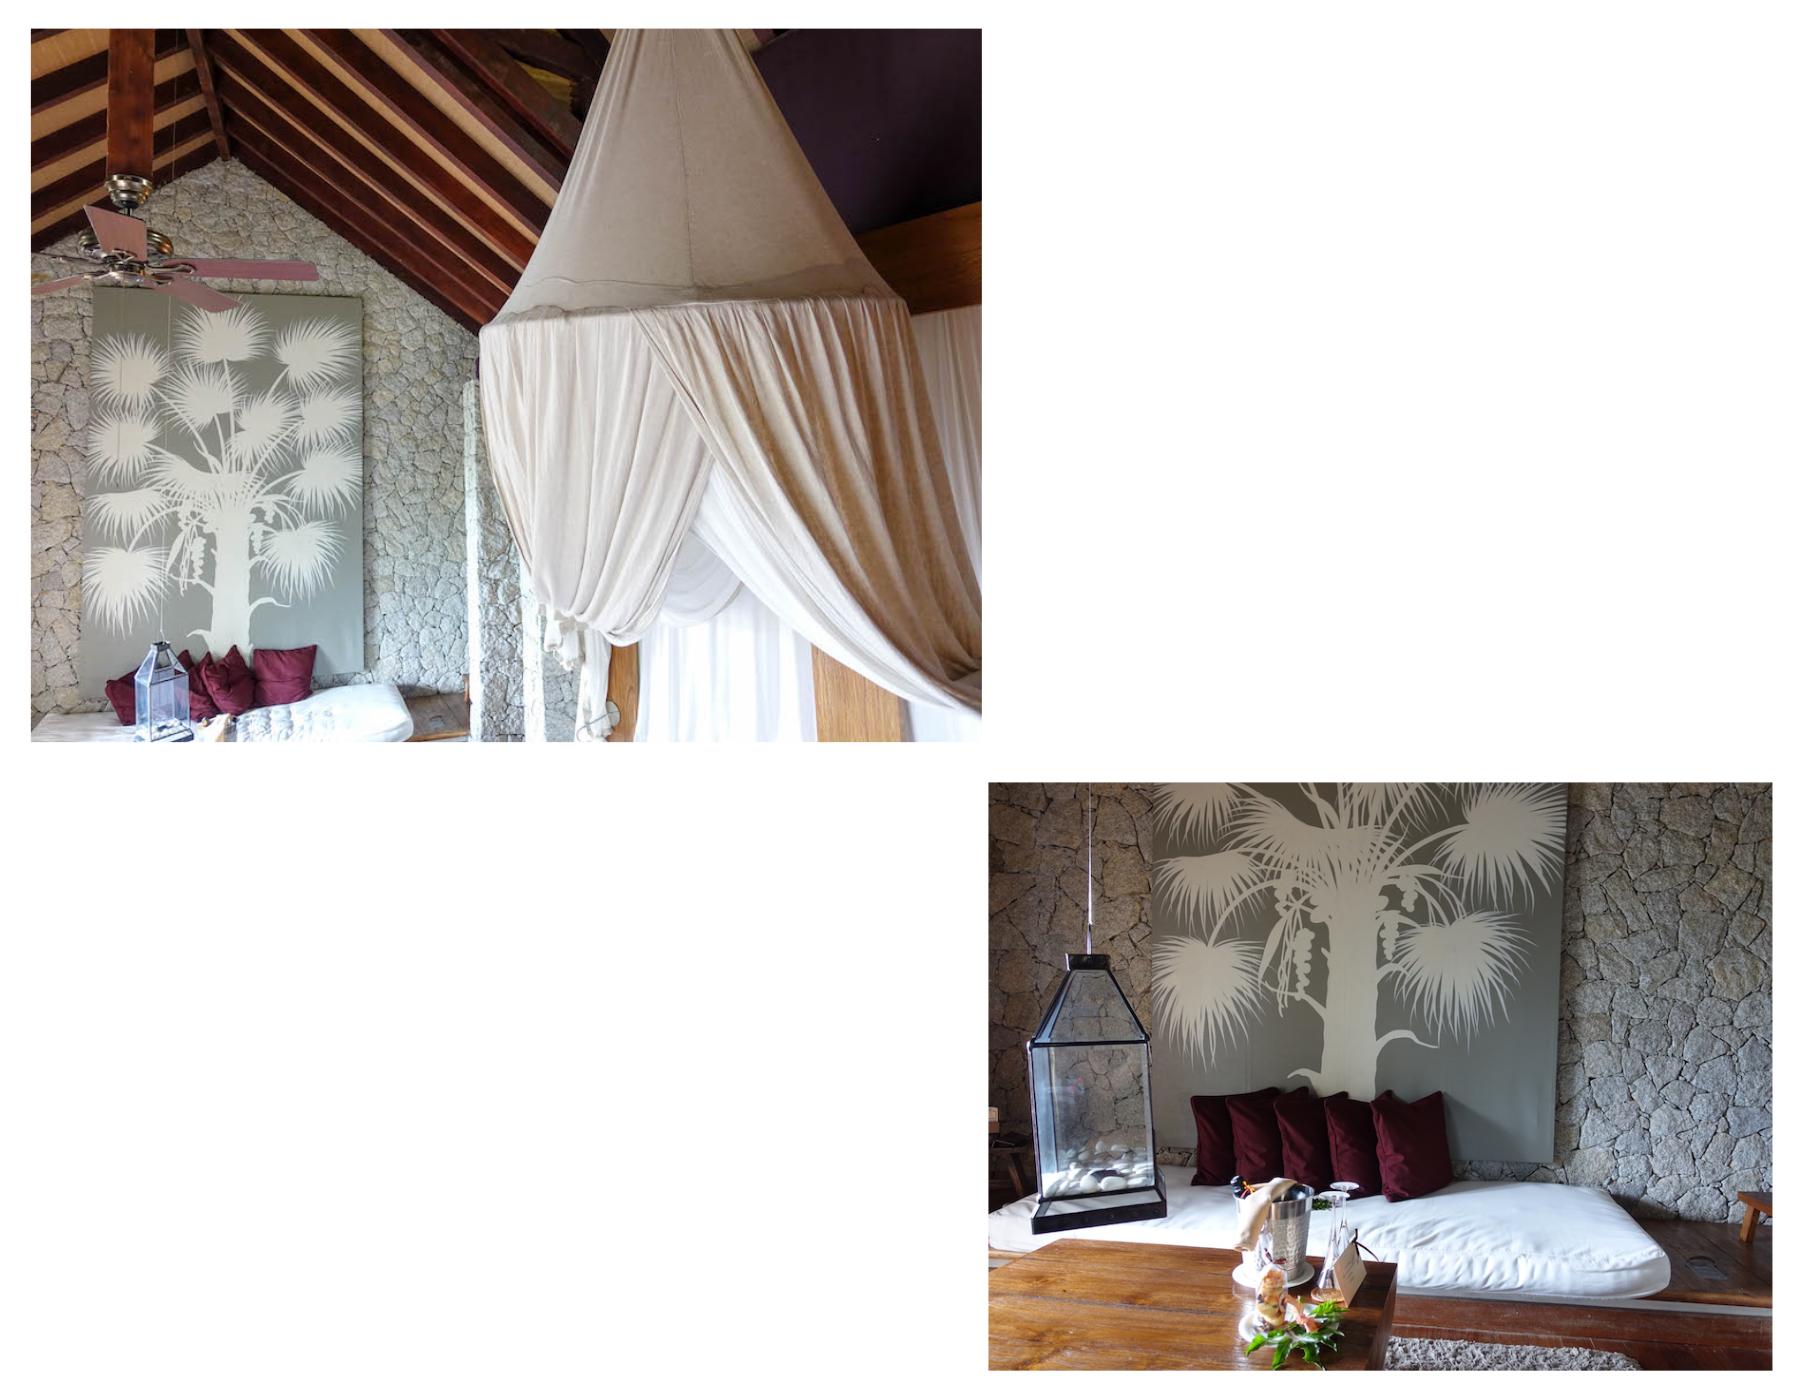 suelovesnyc_seychellen_hotel_auf_la_digue_domaine_de_lorangeraie_orangeraie_hillside_villa_room